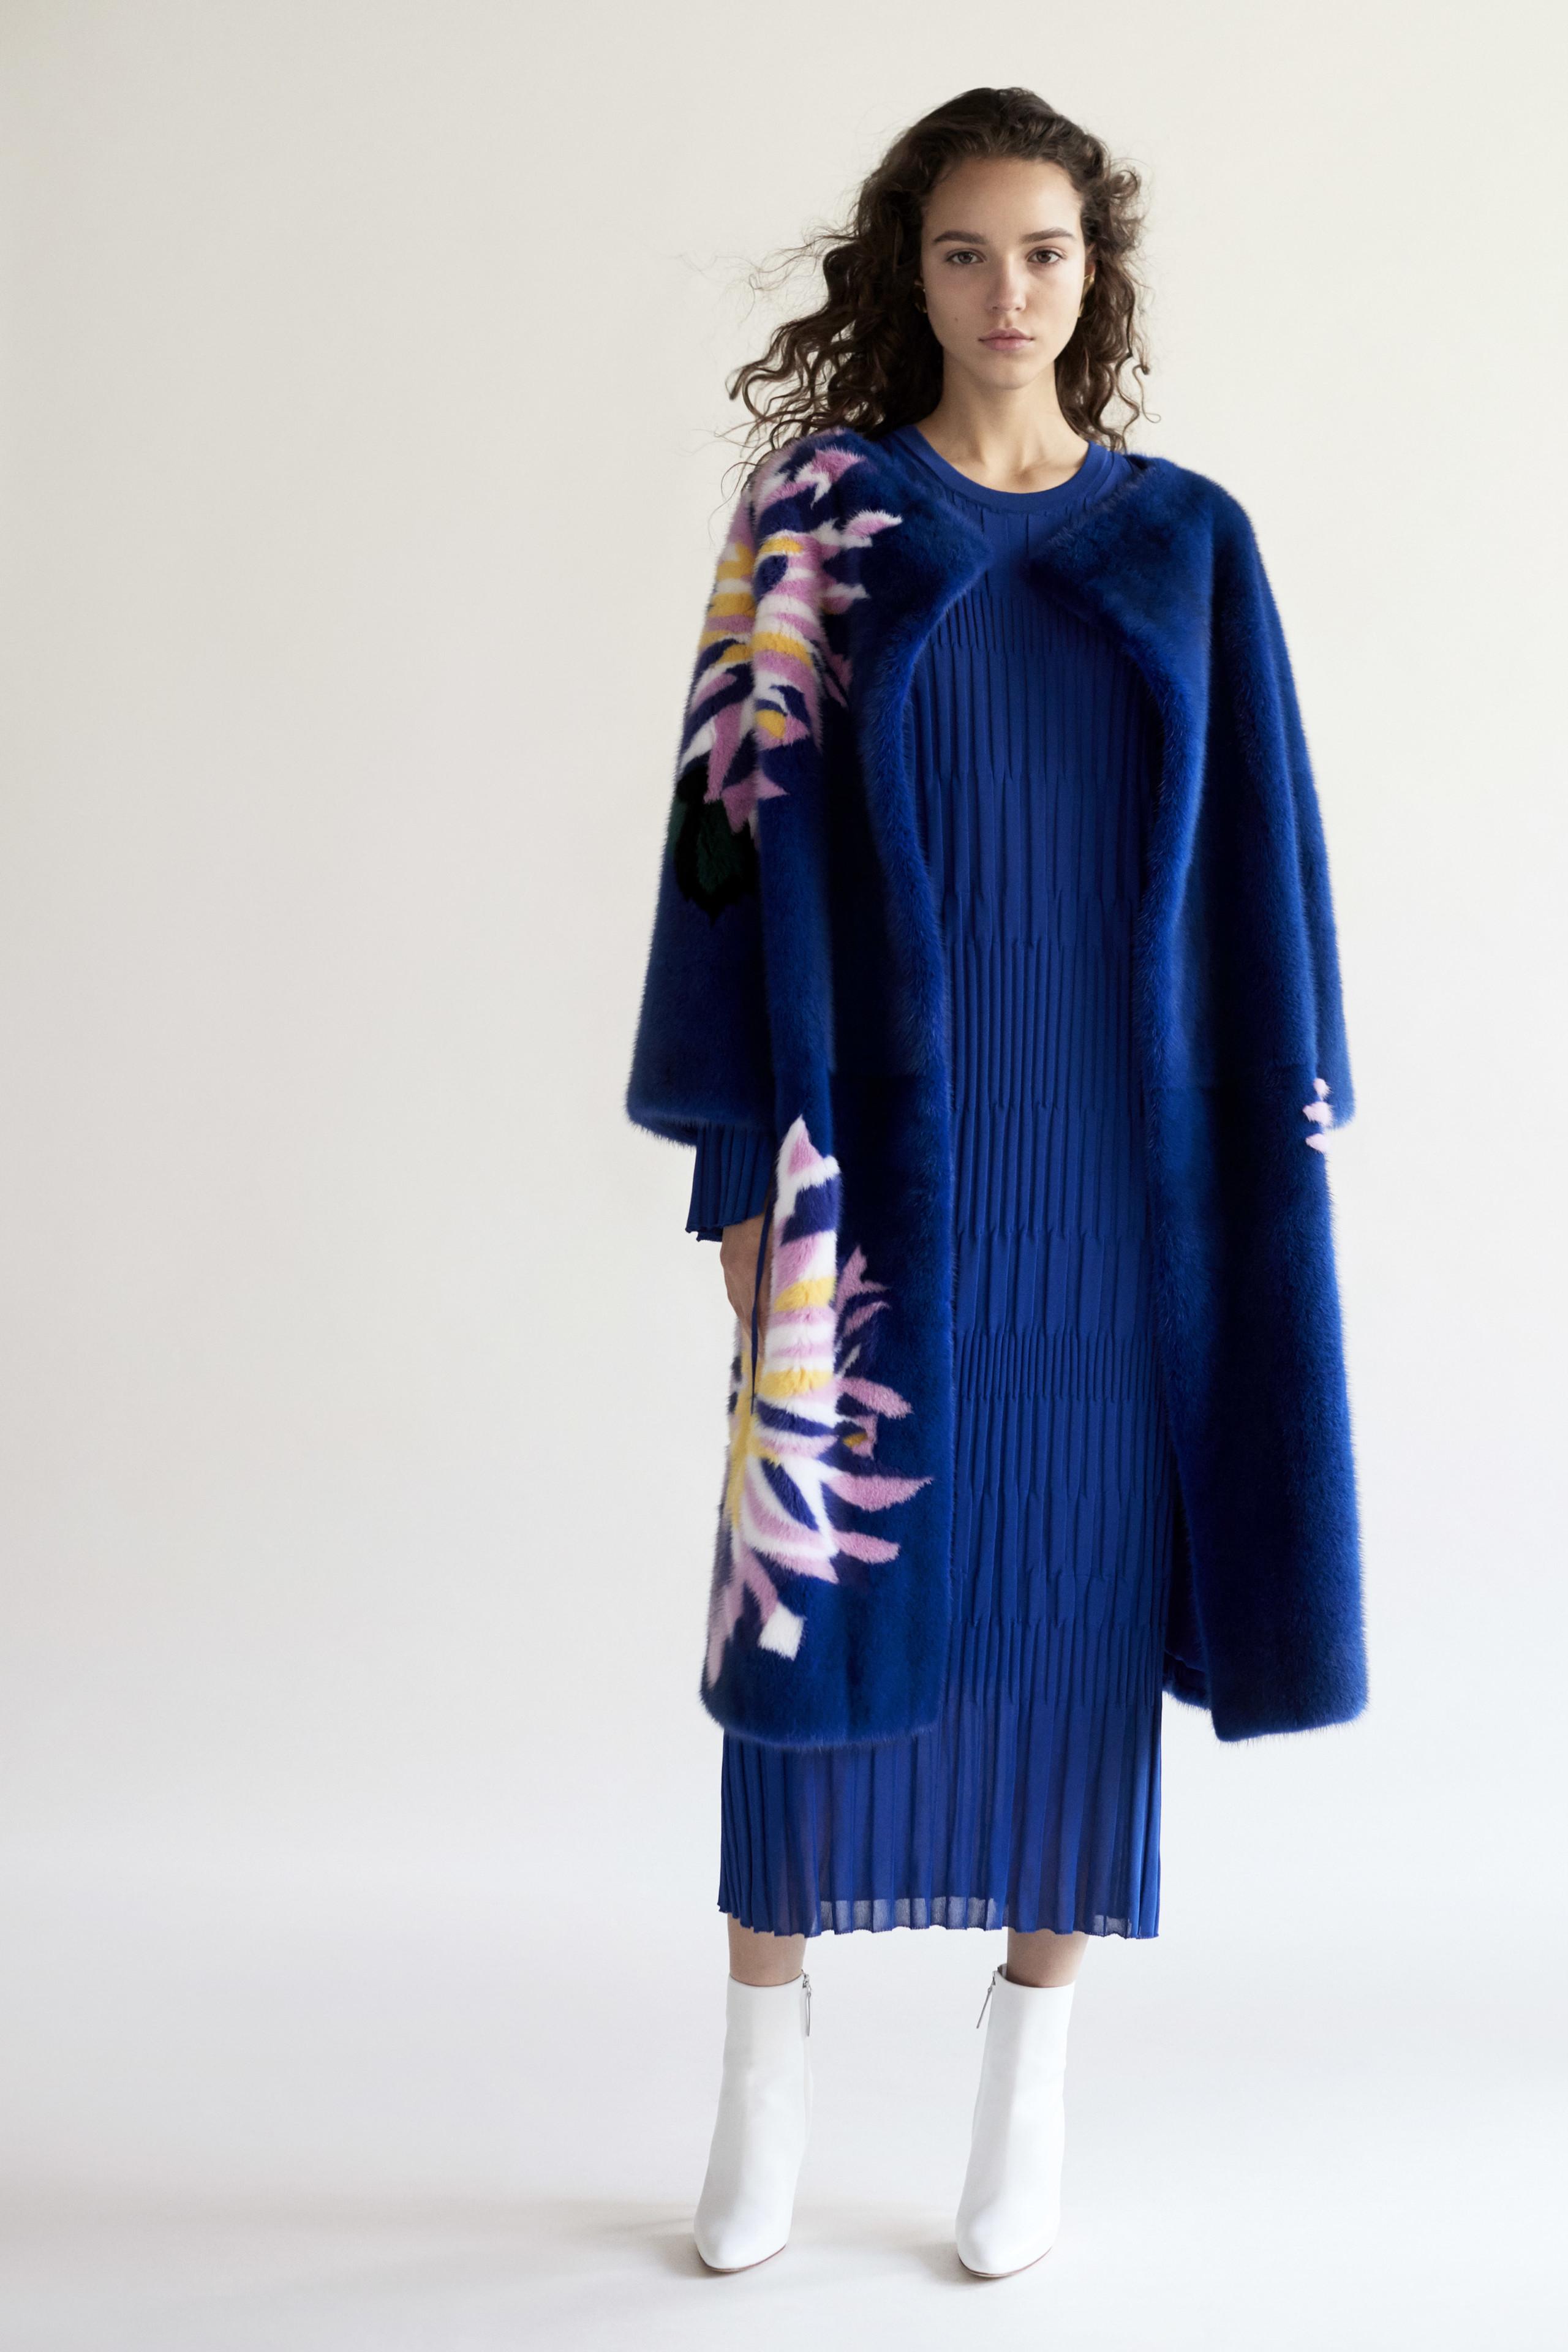 Foto de Carolina Herrera NY Pre Fall 2018: una maravillosa colección de Alta Costura (10/33)